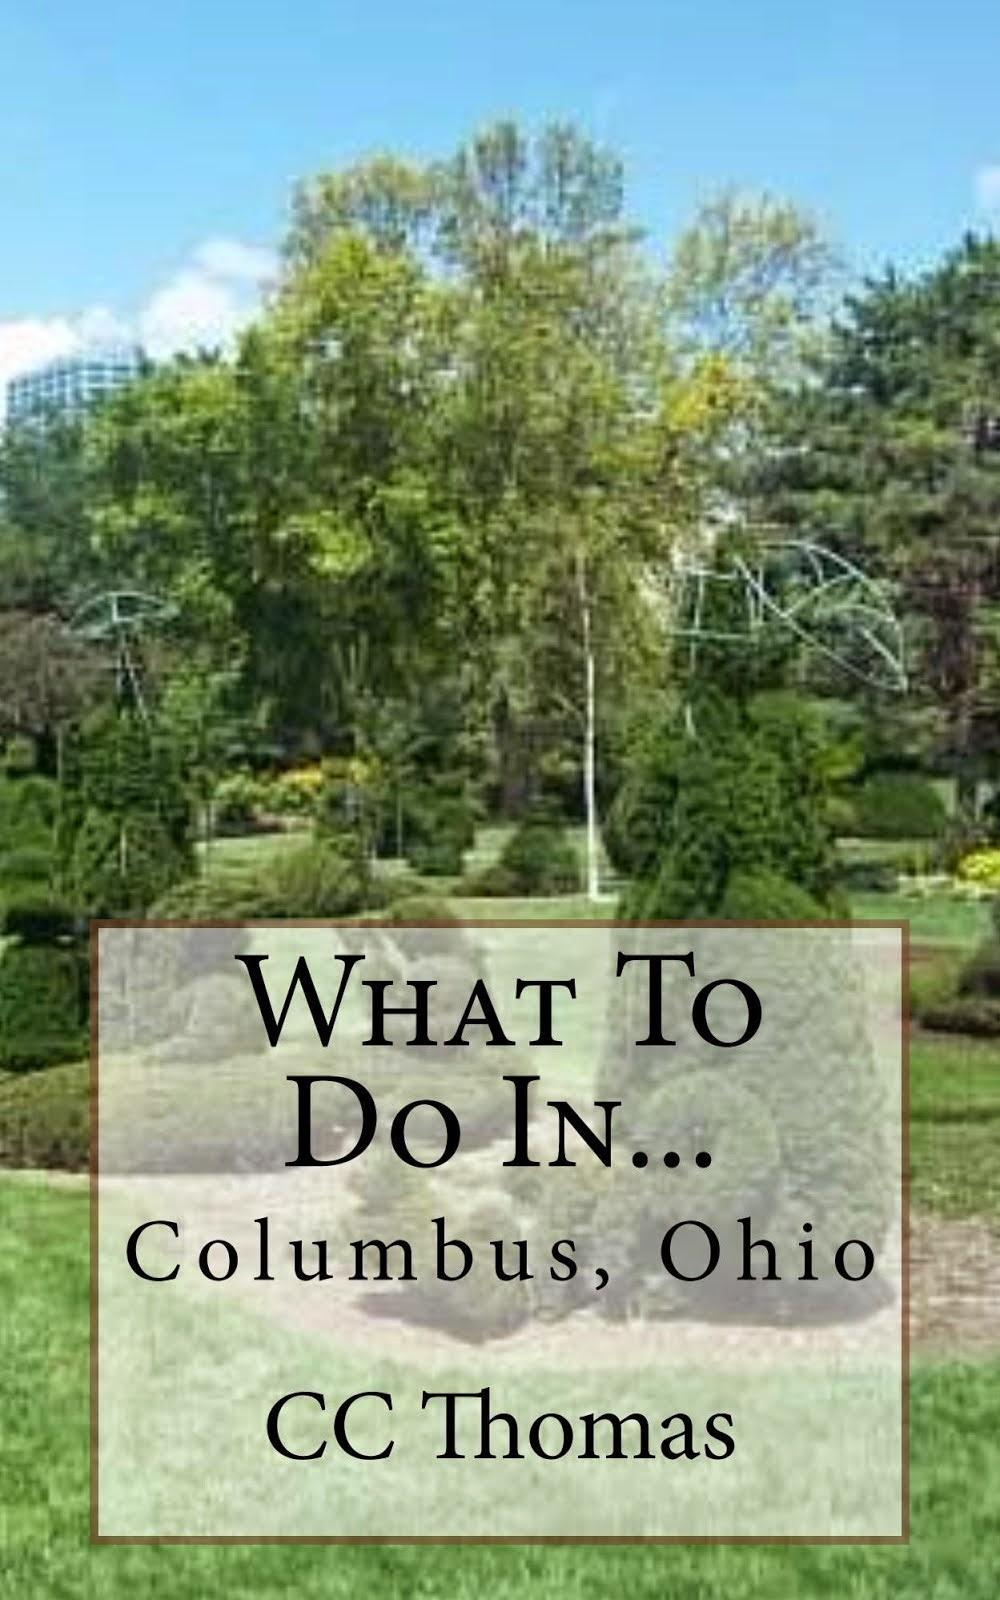 What To Do In...Columbus, Ohio